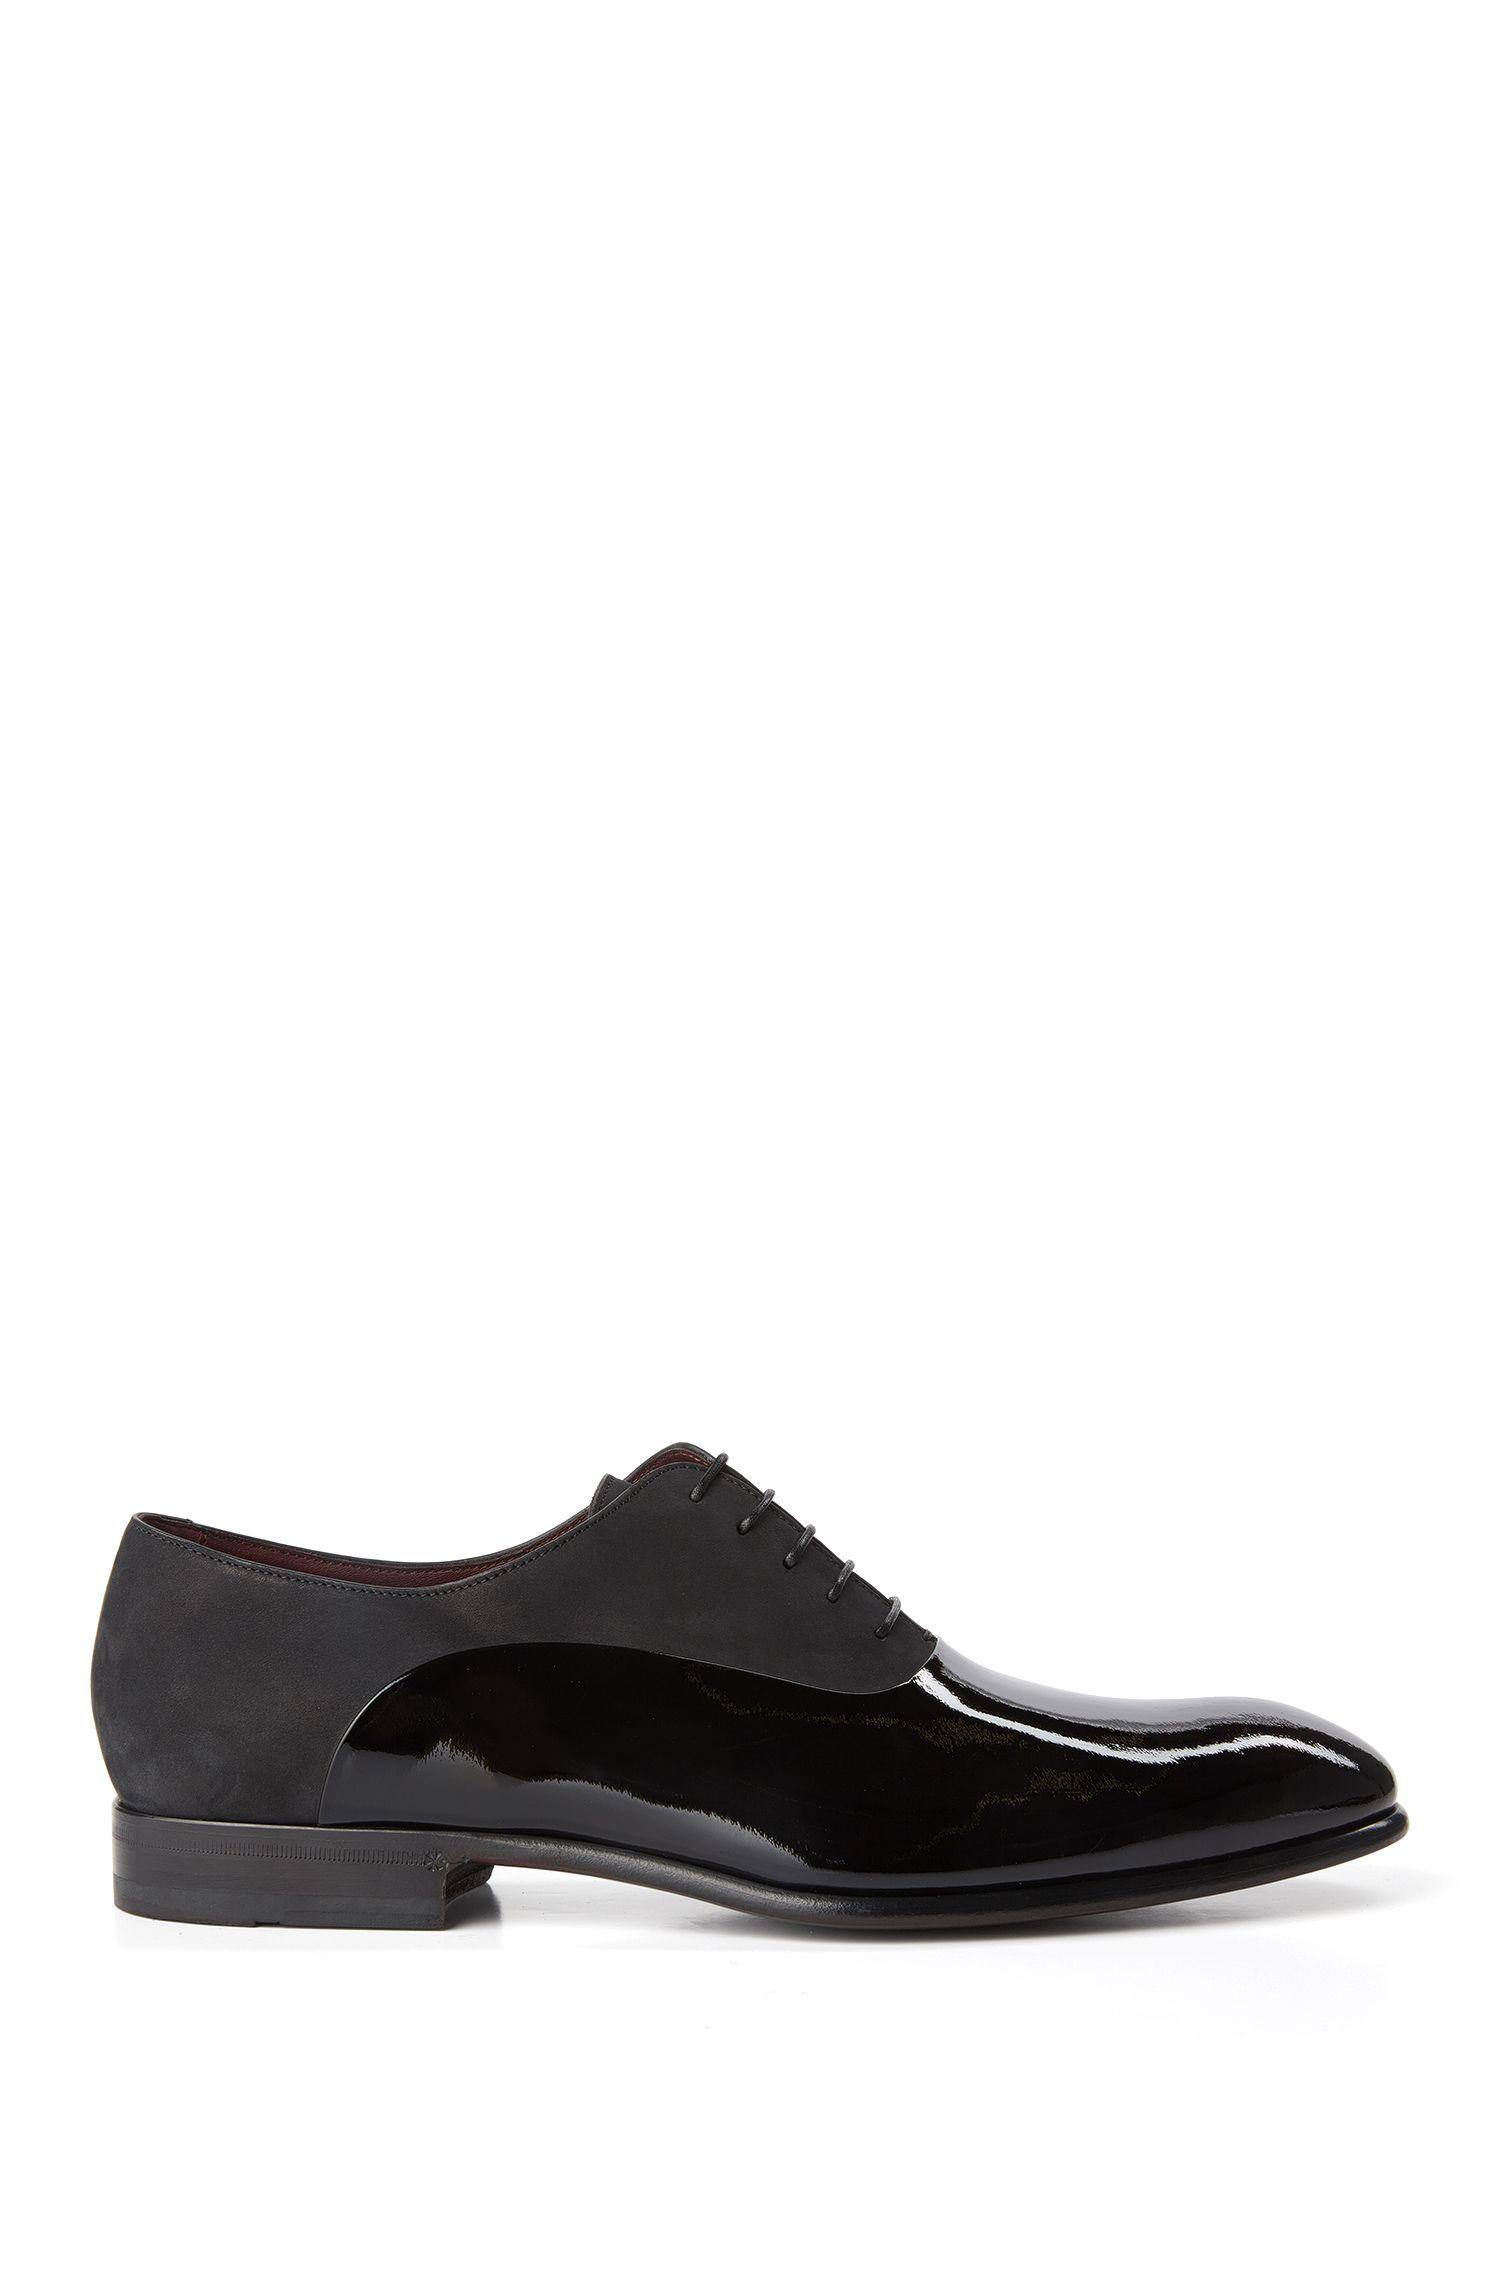 'T-Legend Oxfr Panu'   Italian Calfskin Nubuck Patent Oxford Dress Shoes